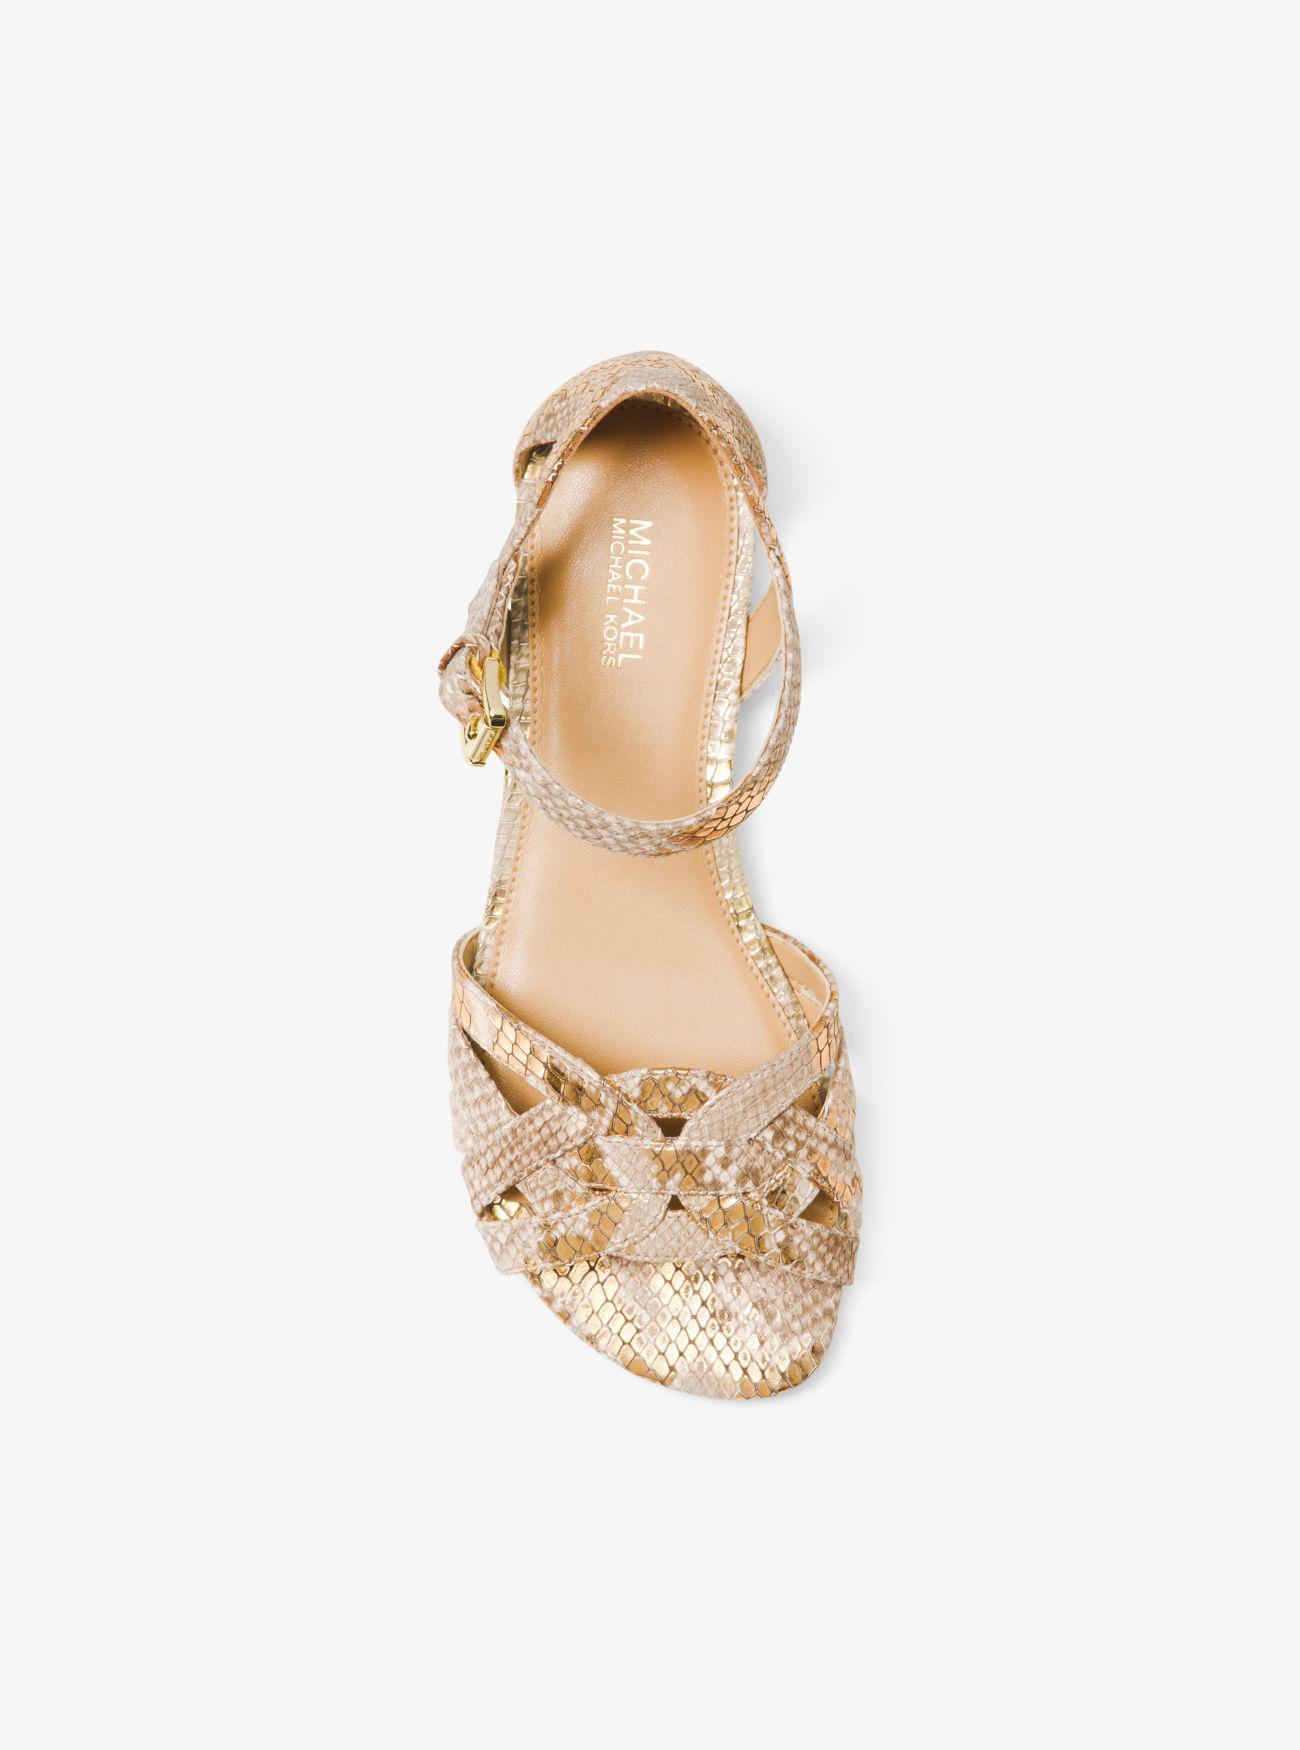 Michael Kors Annaliese Metallic Embossed Leather Sandal Lyst